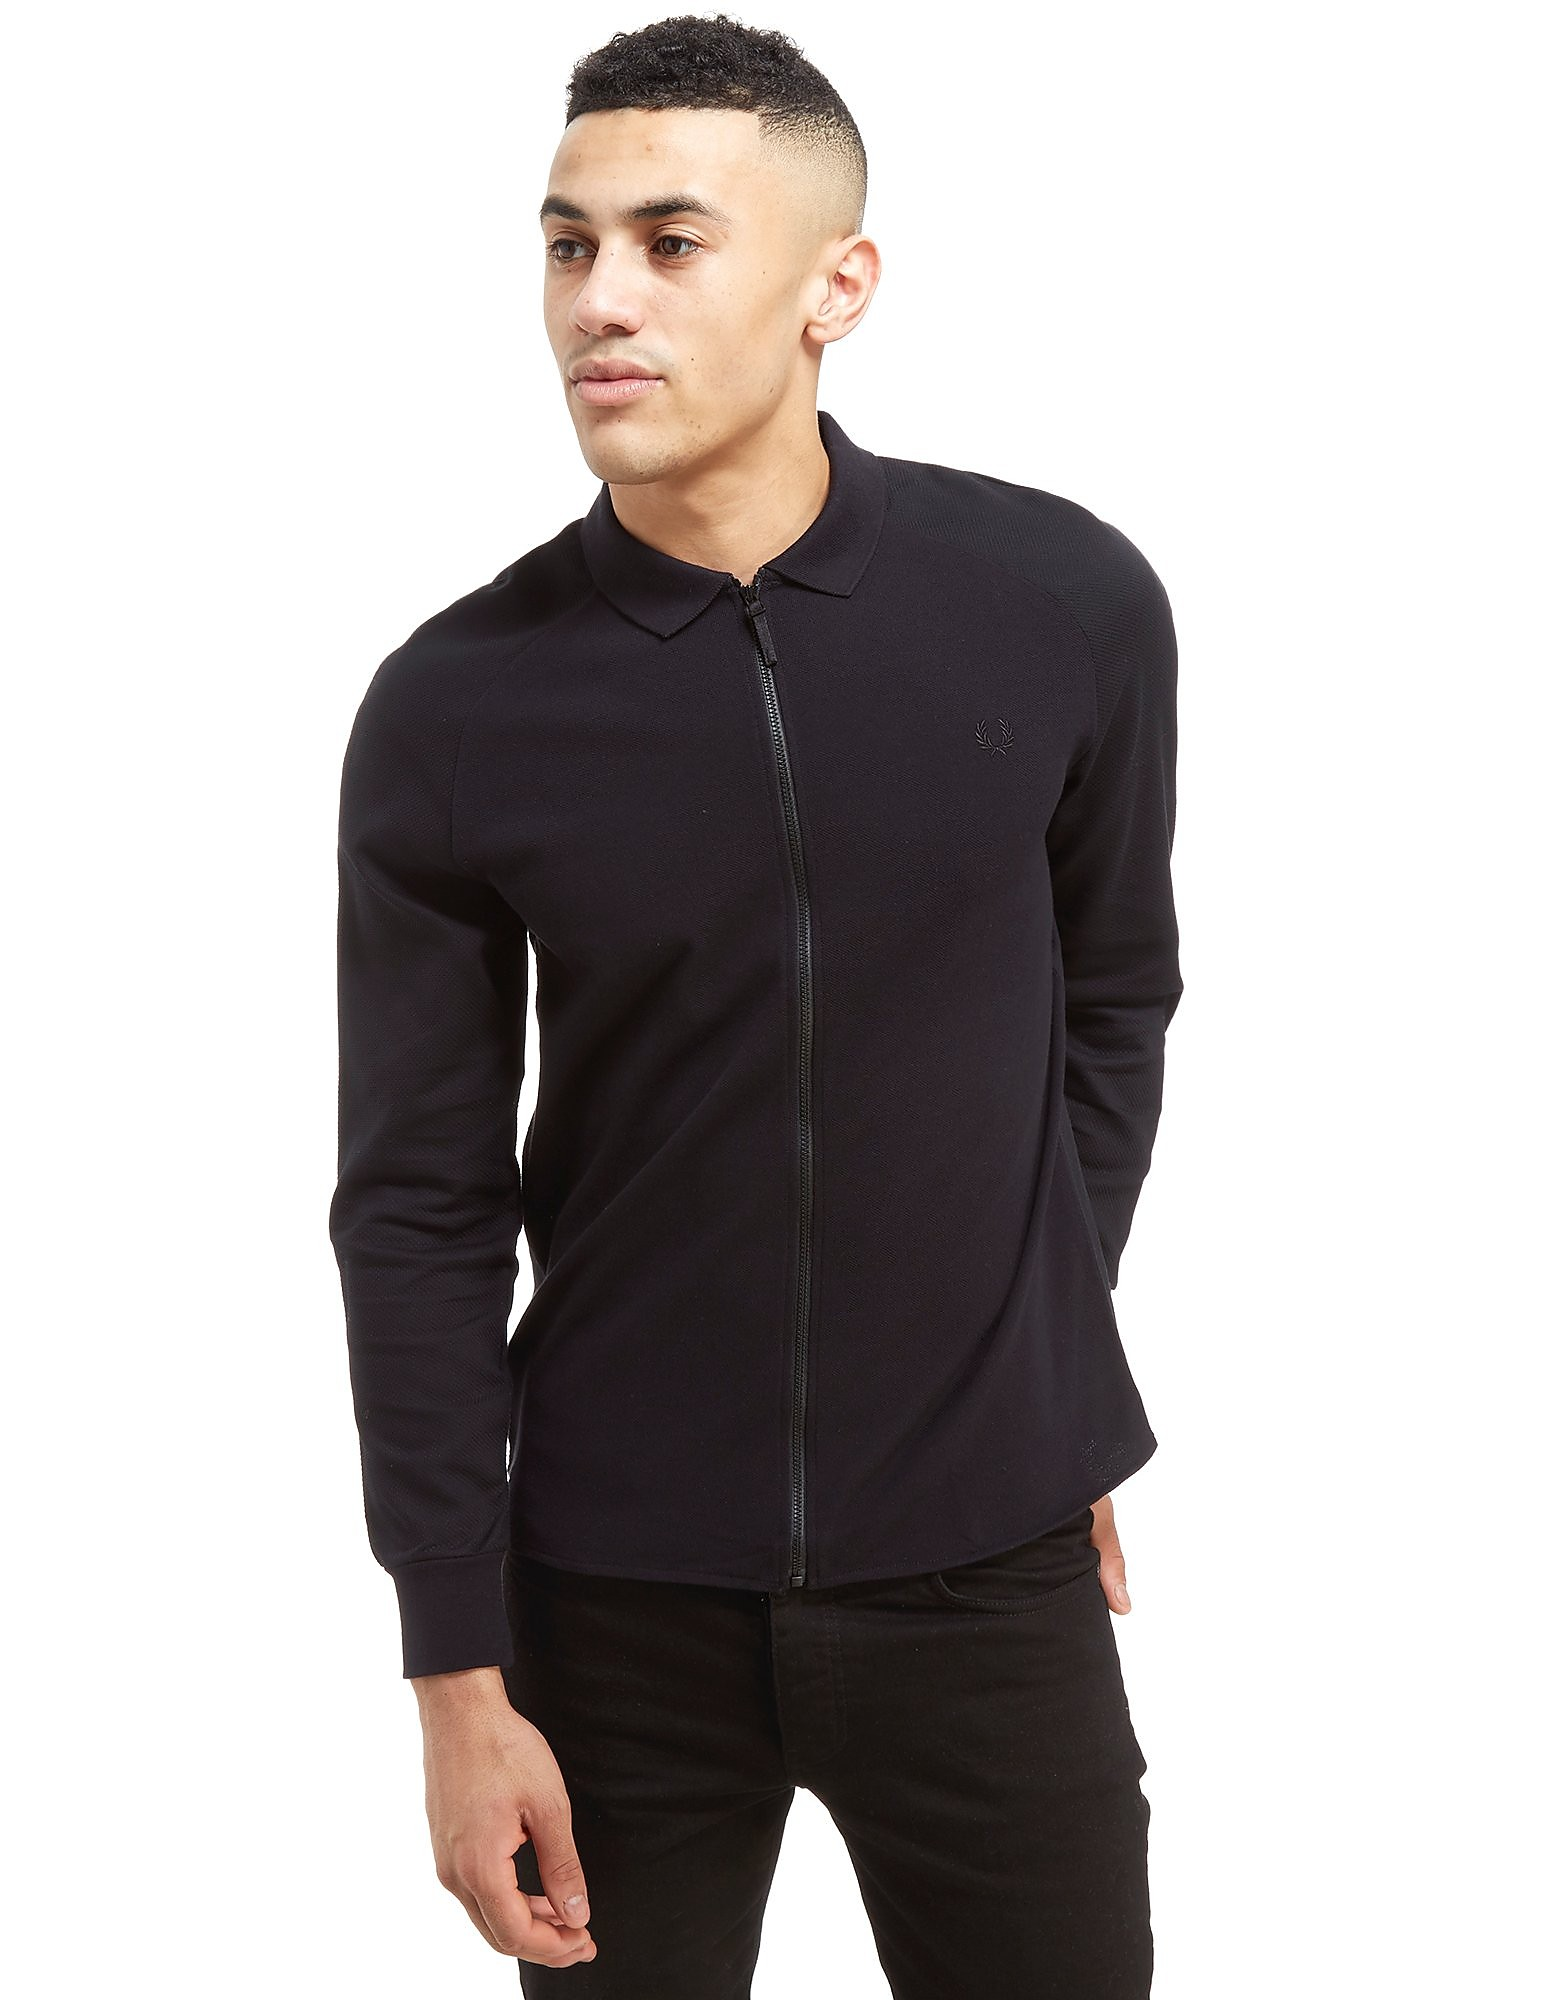 Fred Perry Long Sleeve Zip Through Pique Shirt